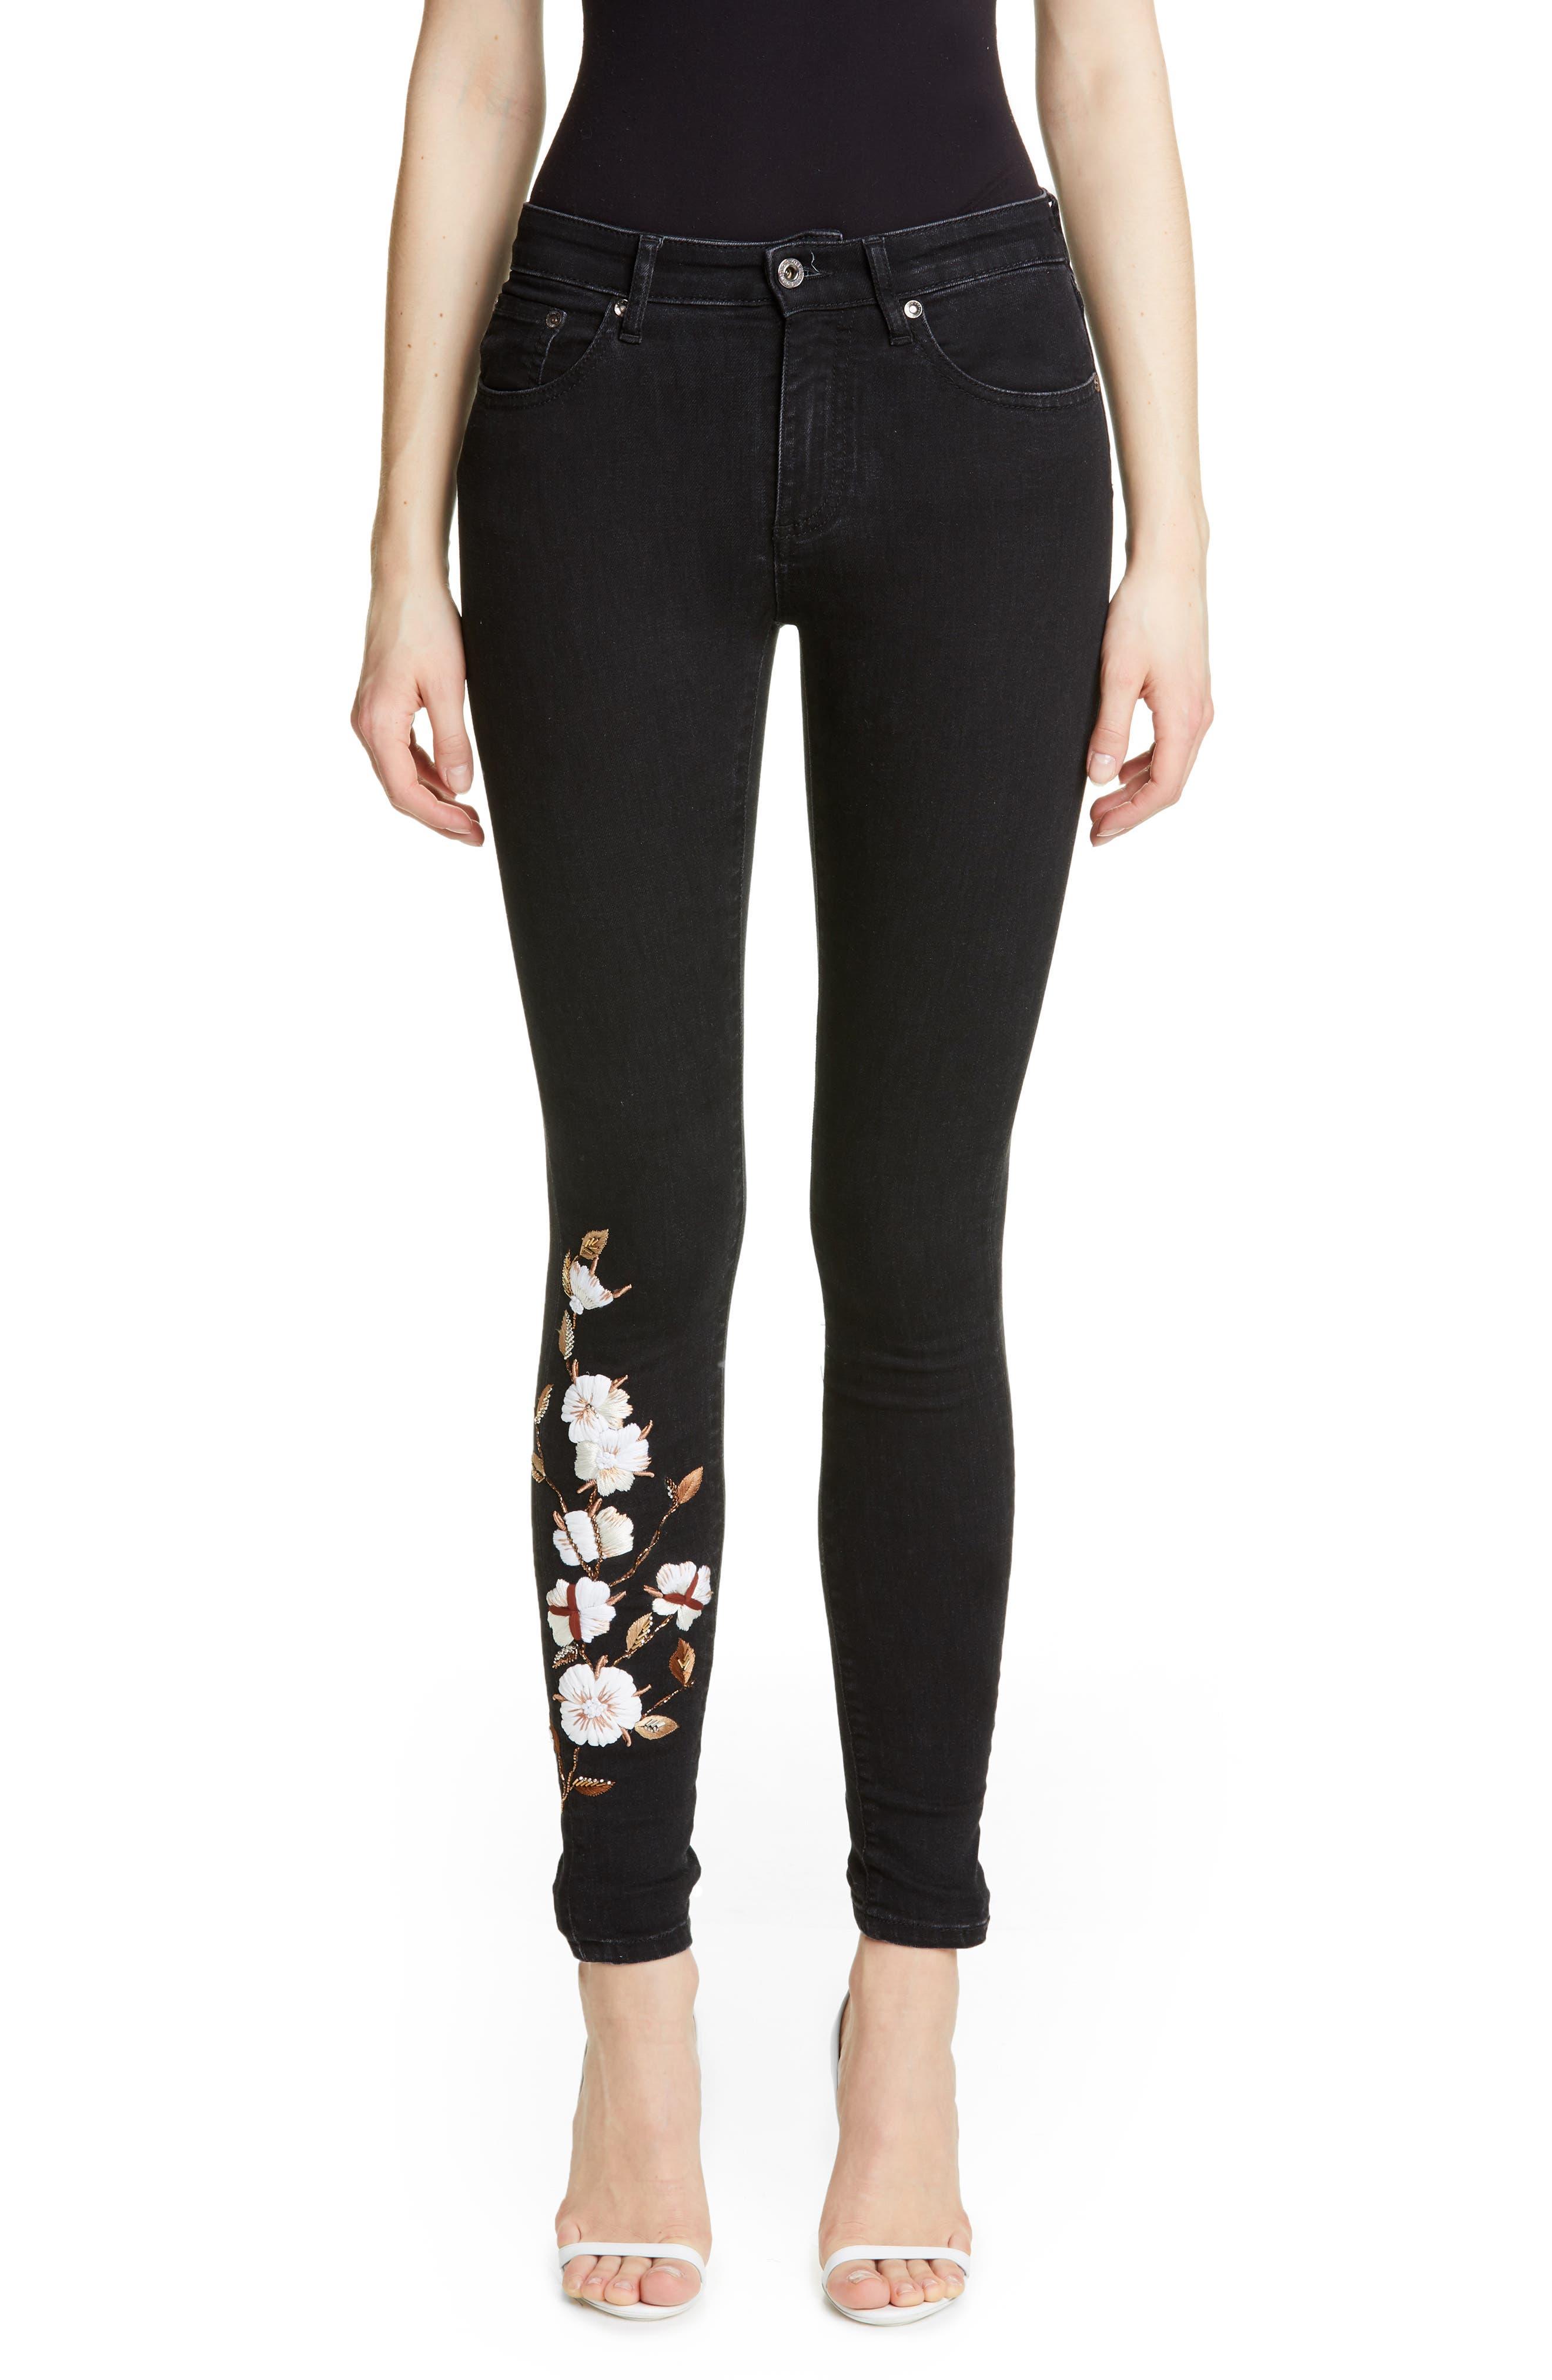 OFF-WHITE Floral Embroidered Diagonal Stripe Skinny Jeans, Main, color, VINTAGE BLACK